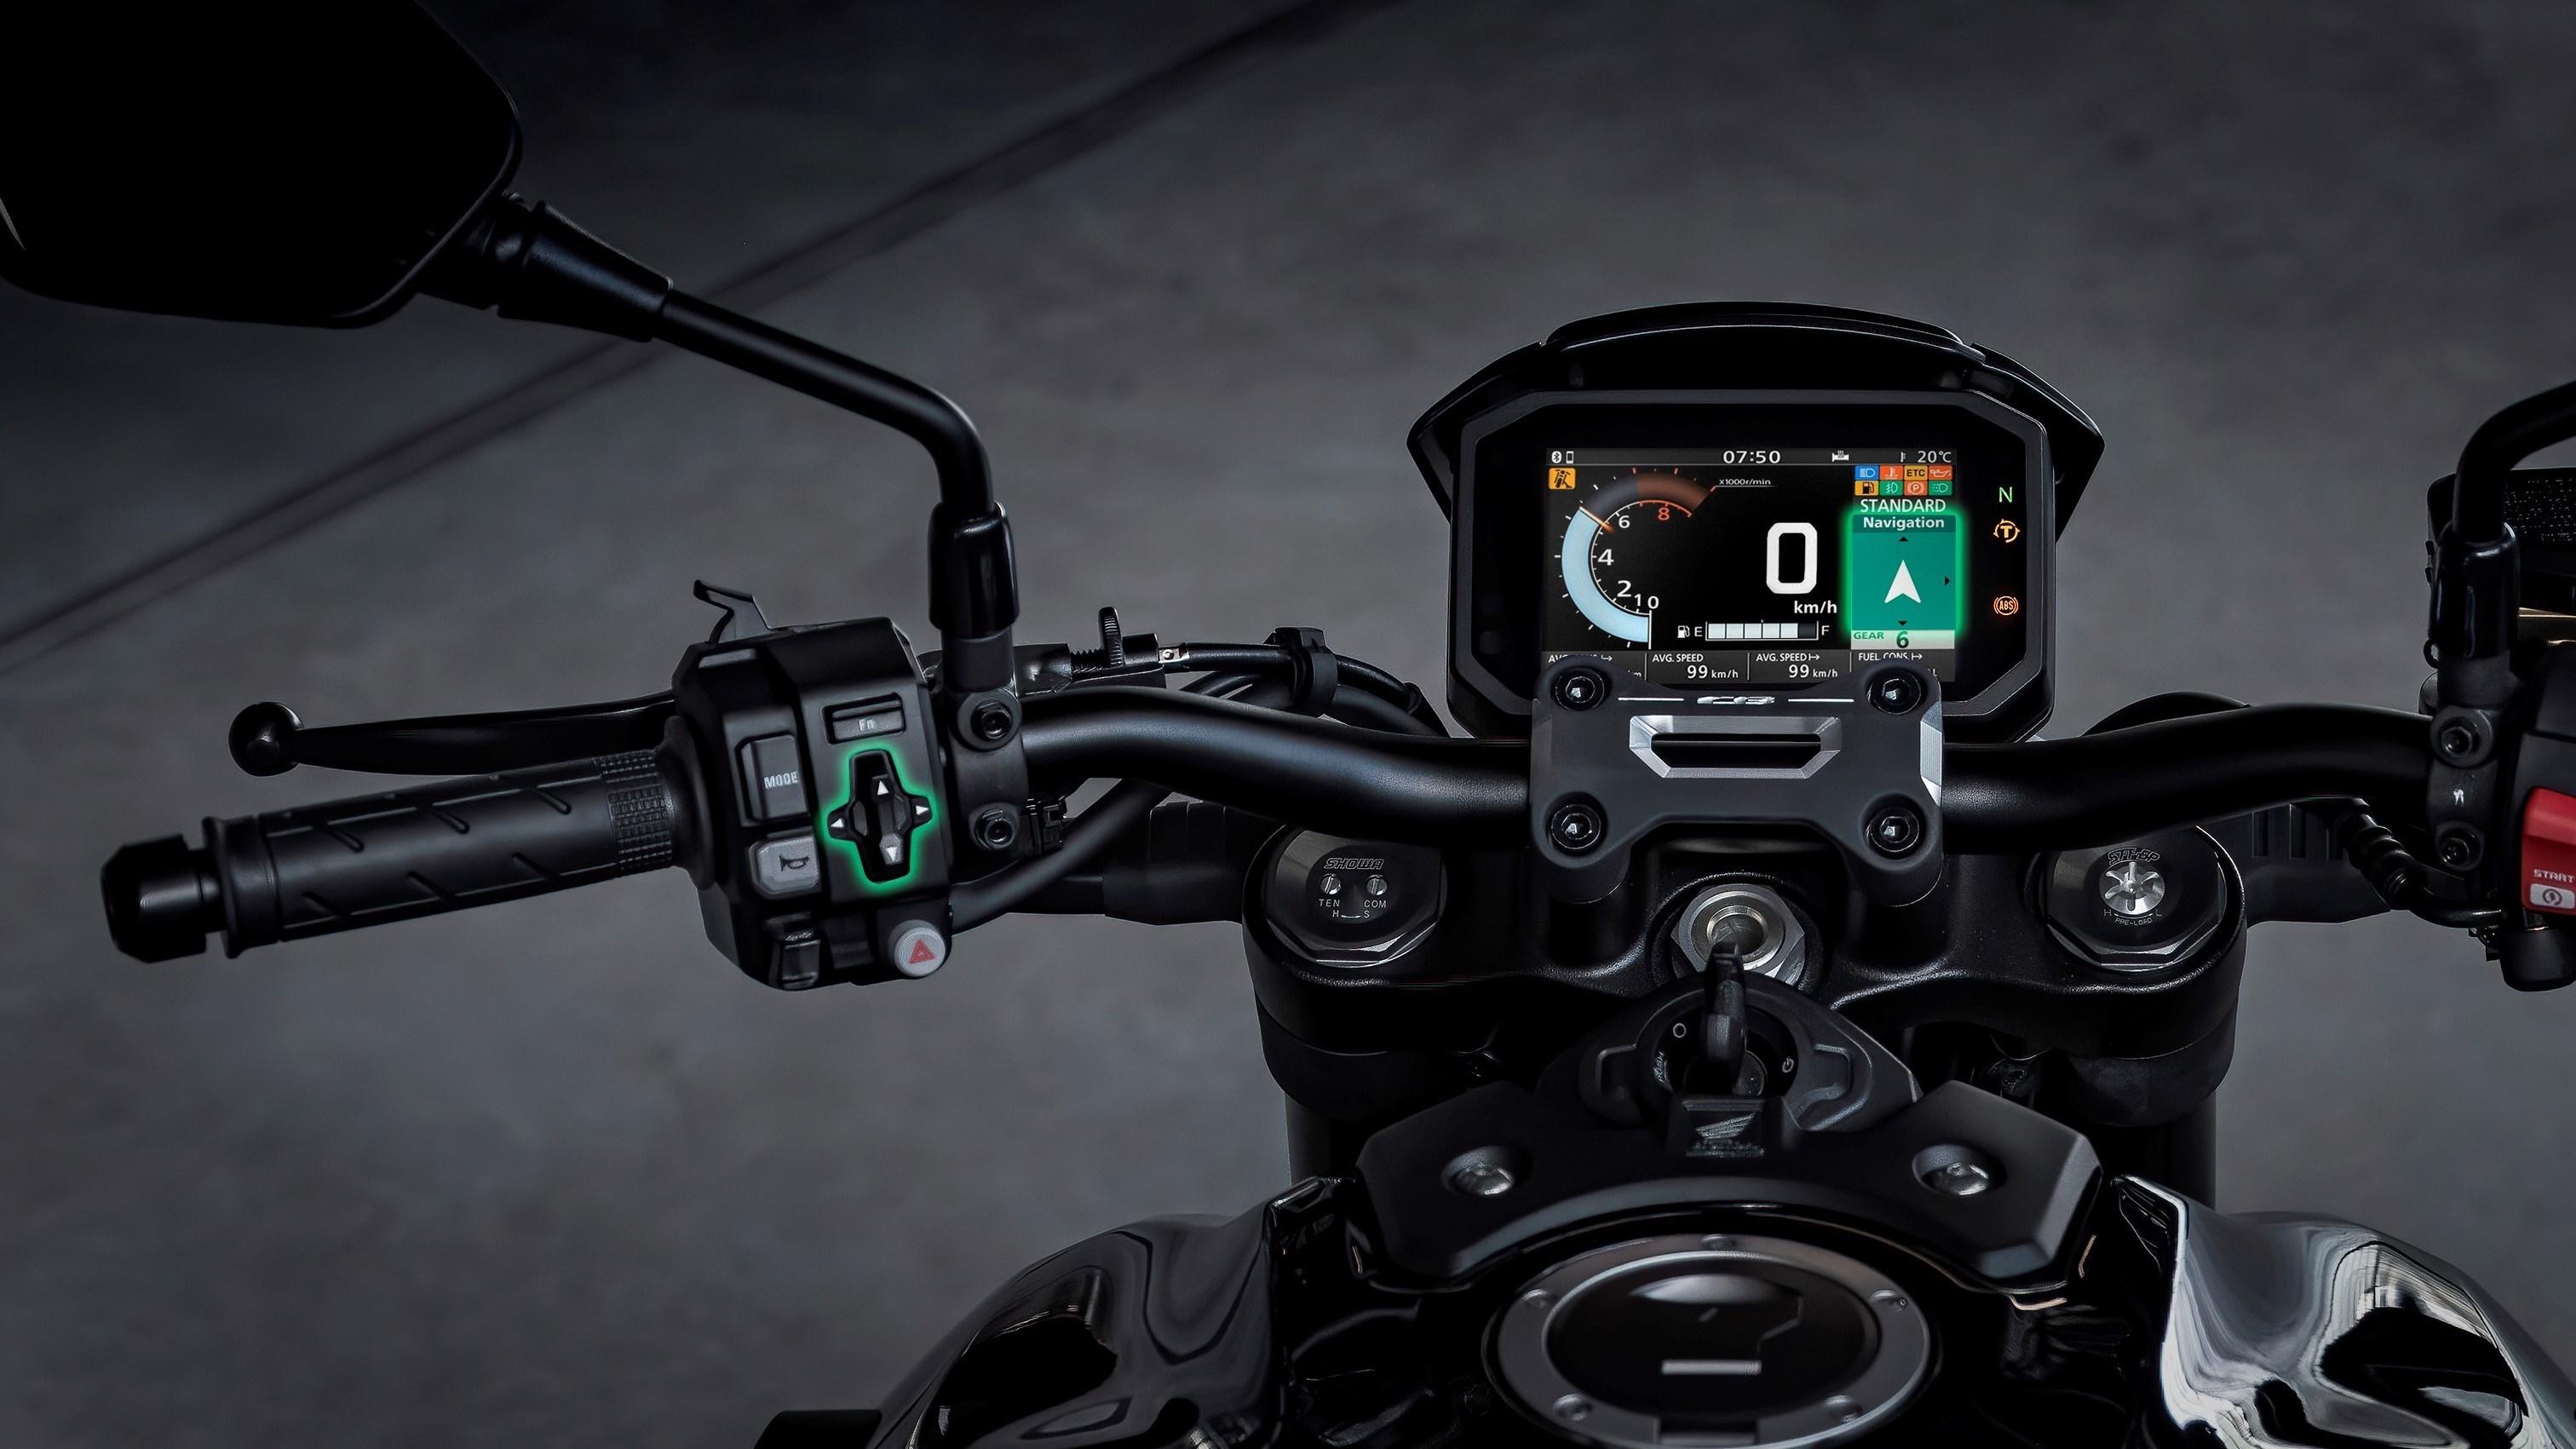 intercomunicador moto, Honda Smarphone Voice Control System